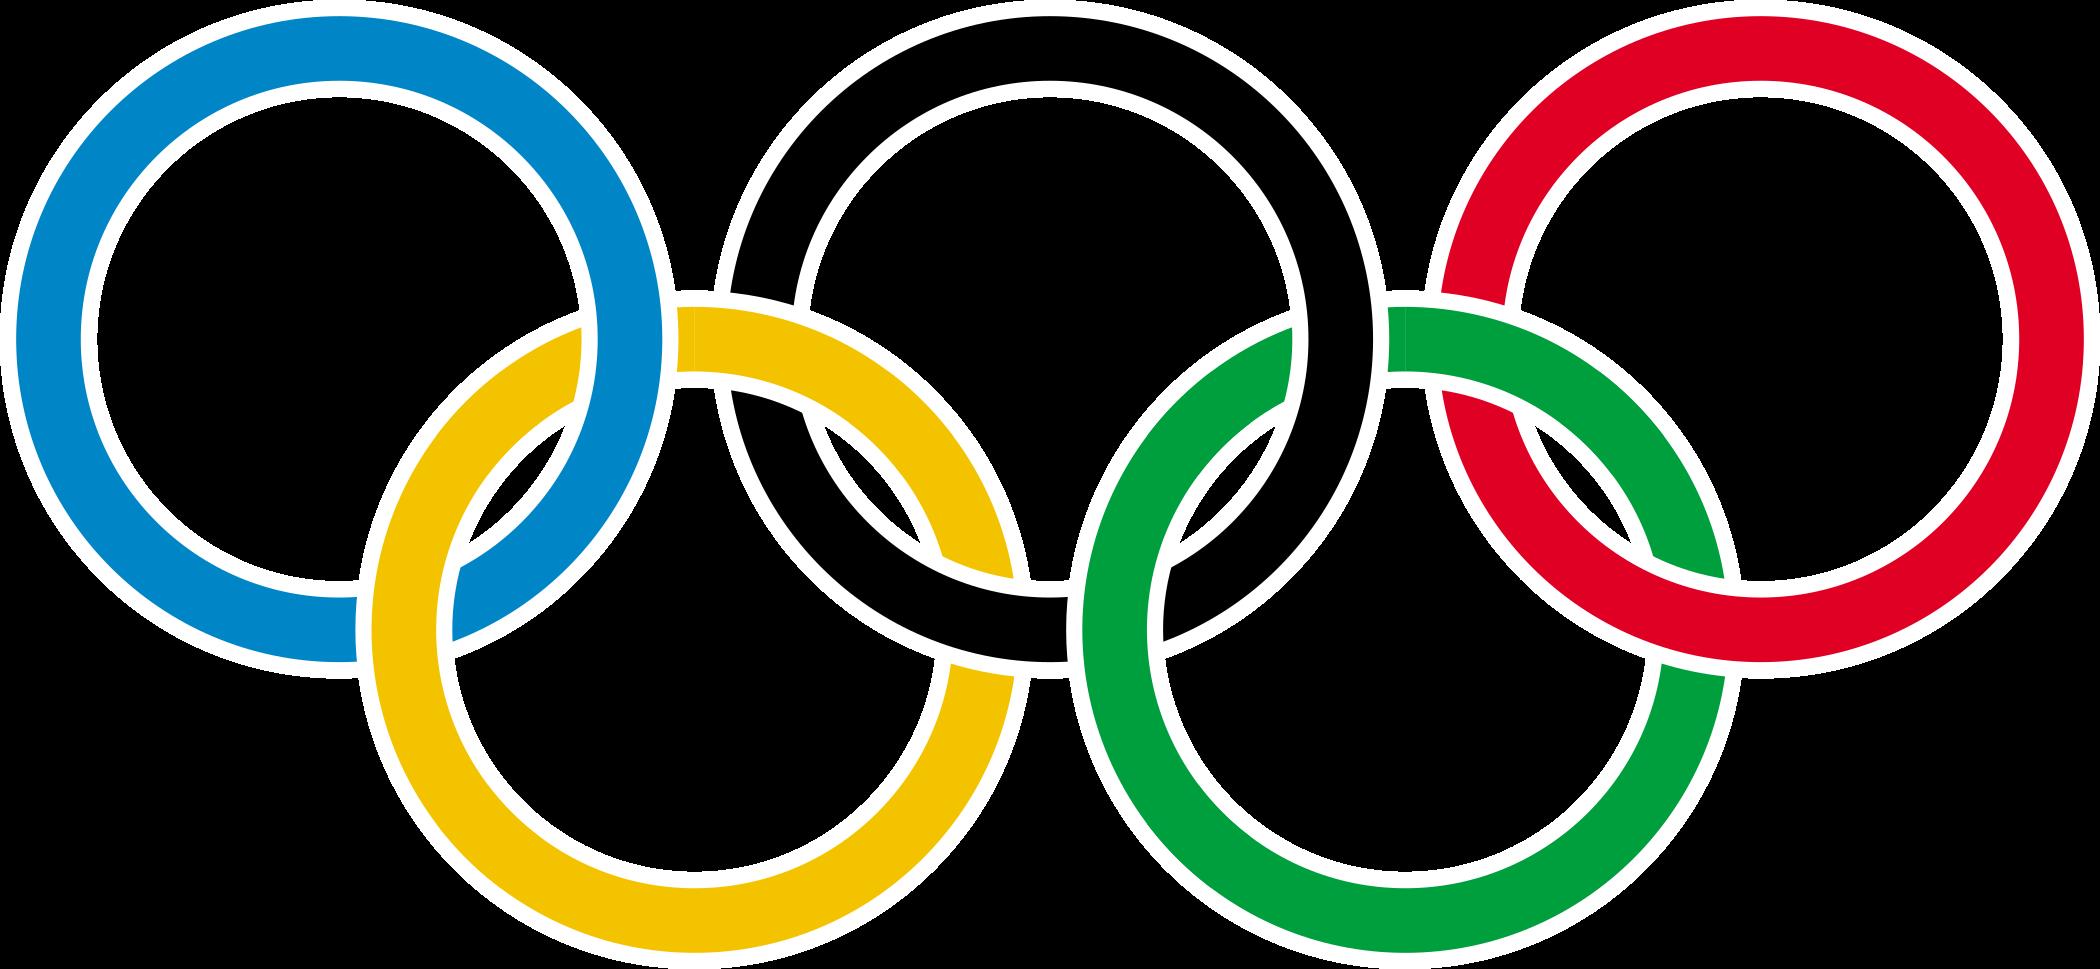 coi-logo-comite-olimpico-internacional-logo-1